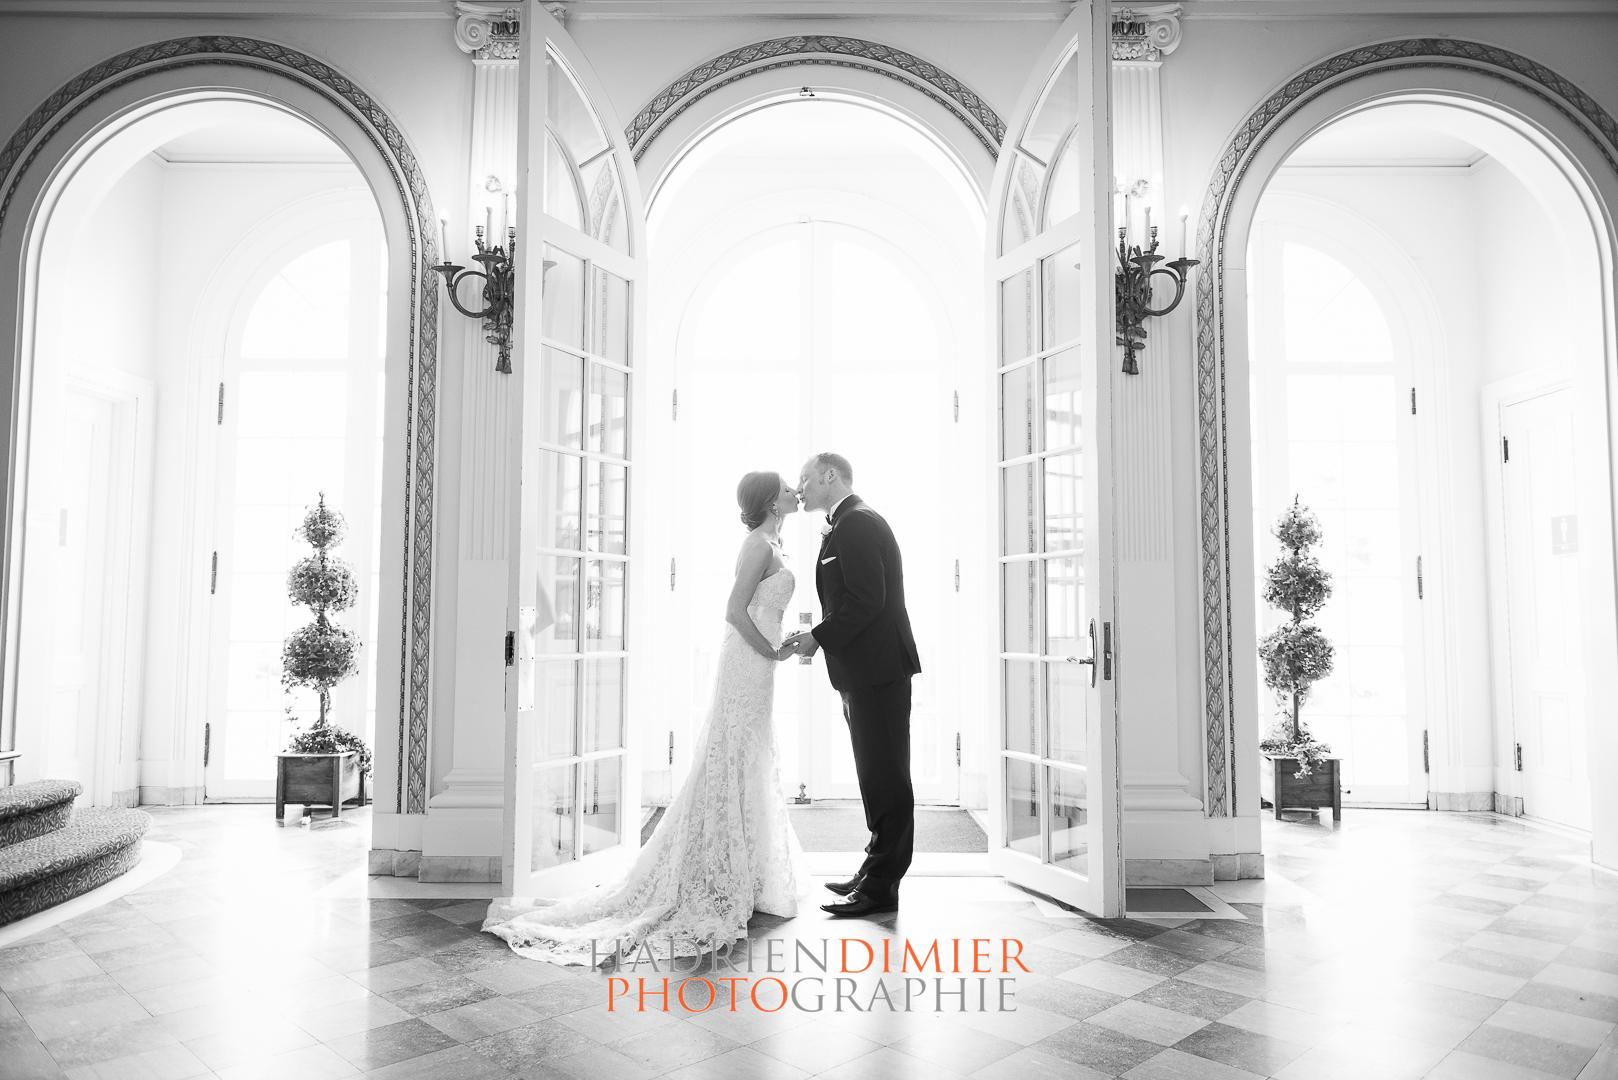 Wilson-Stevens-Productions-Splash-Band-Wedding-Hadrien Dimier Photographie-160422-00128